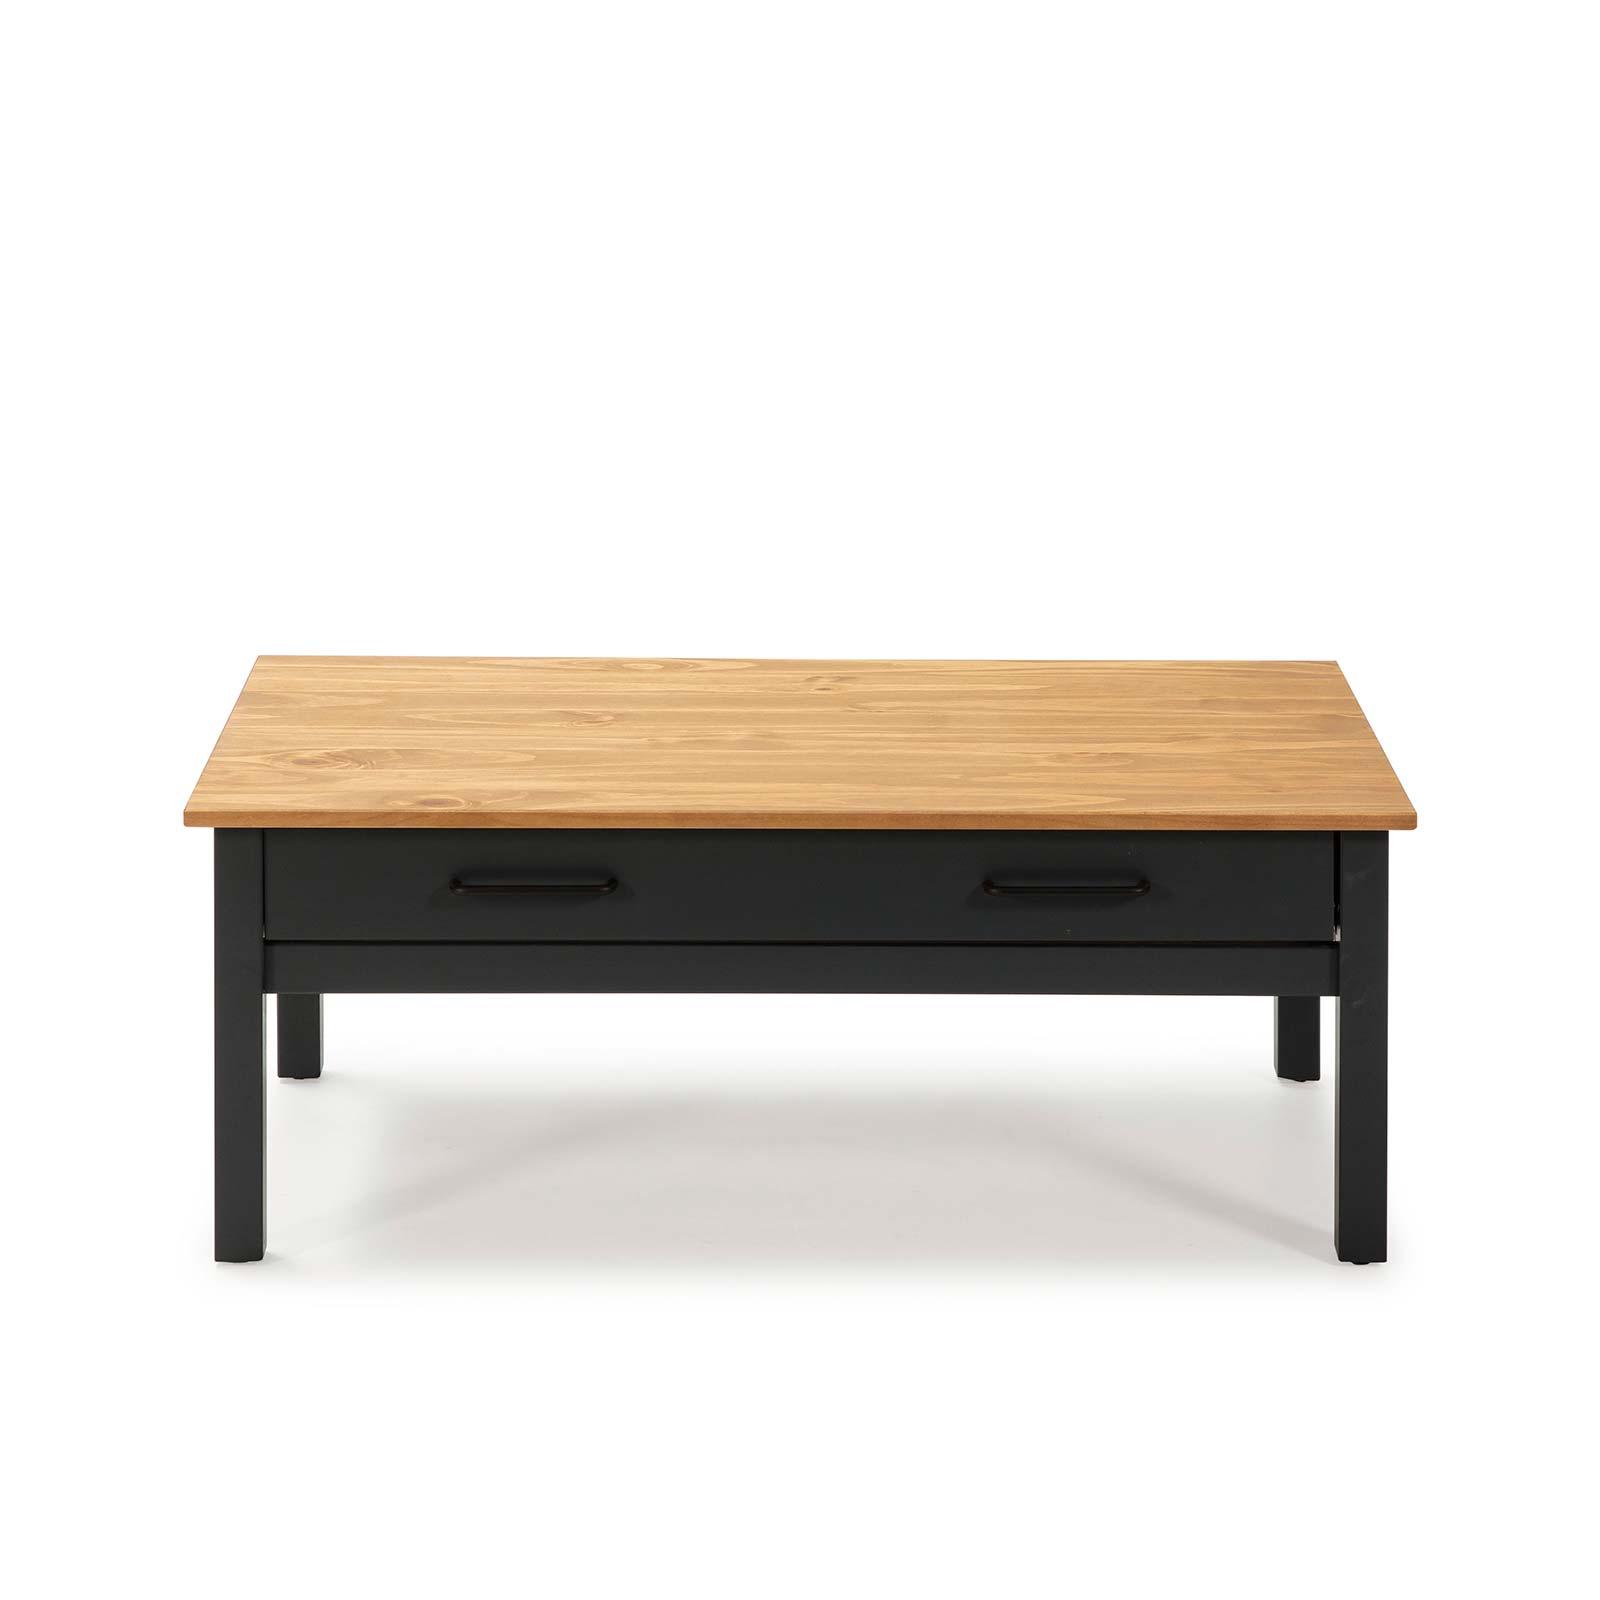 table basse Anversa Holland 13630 FR